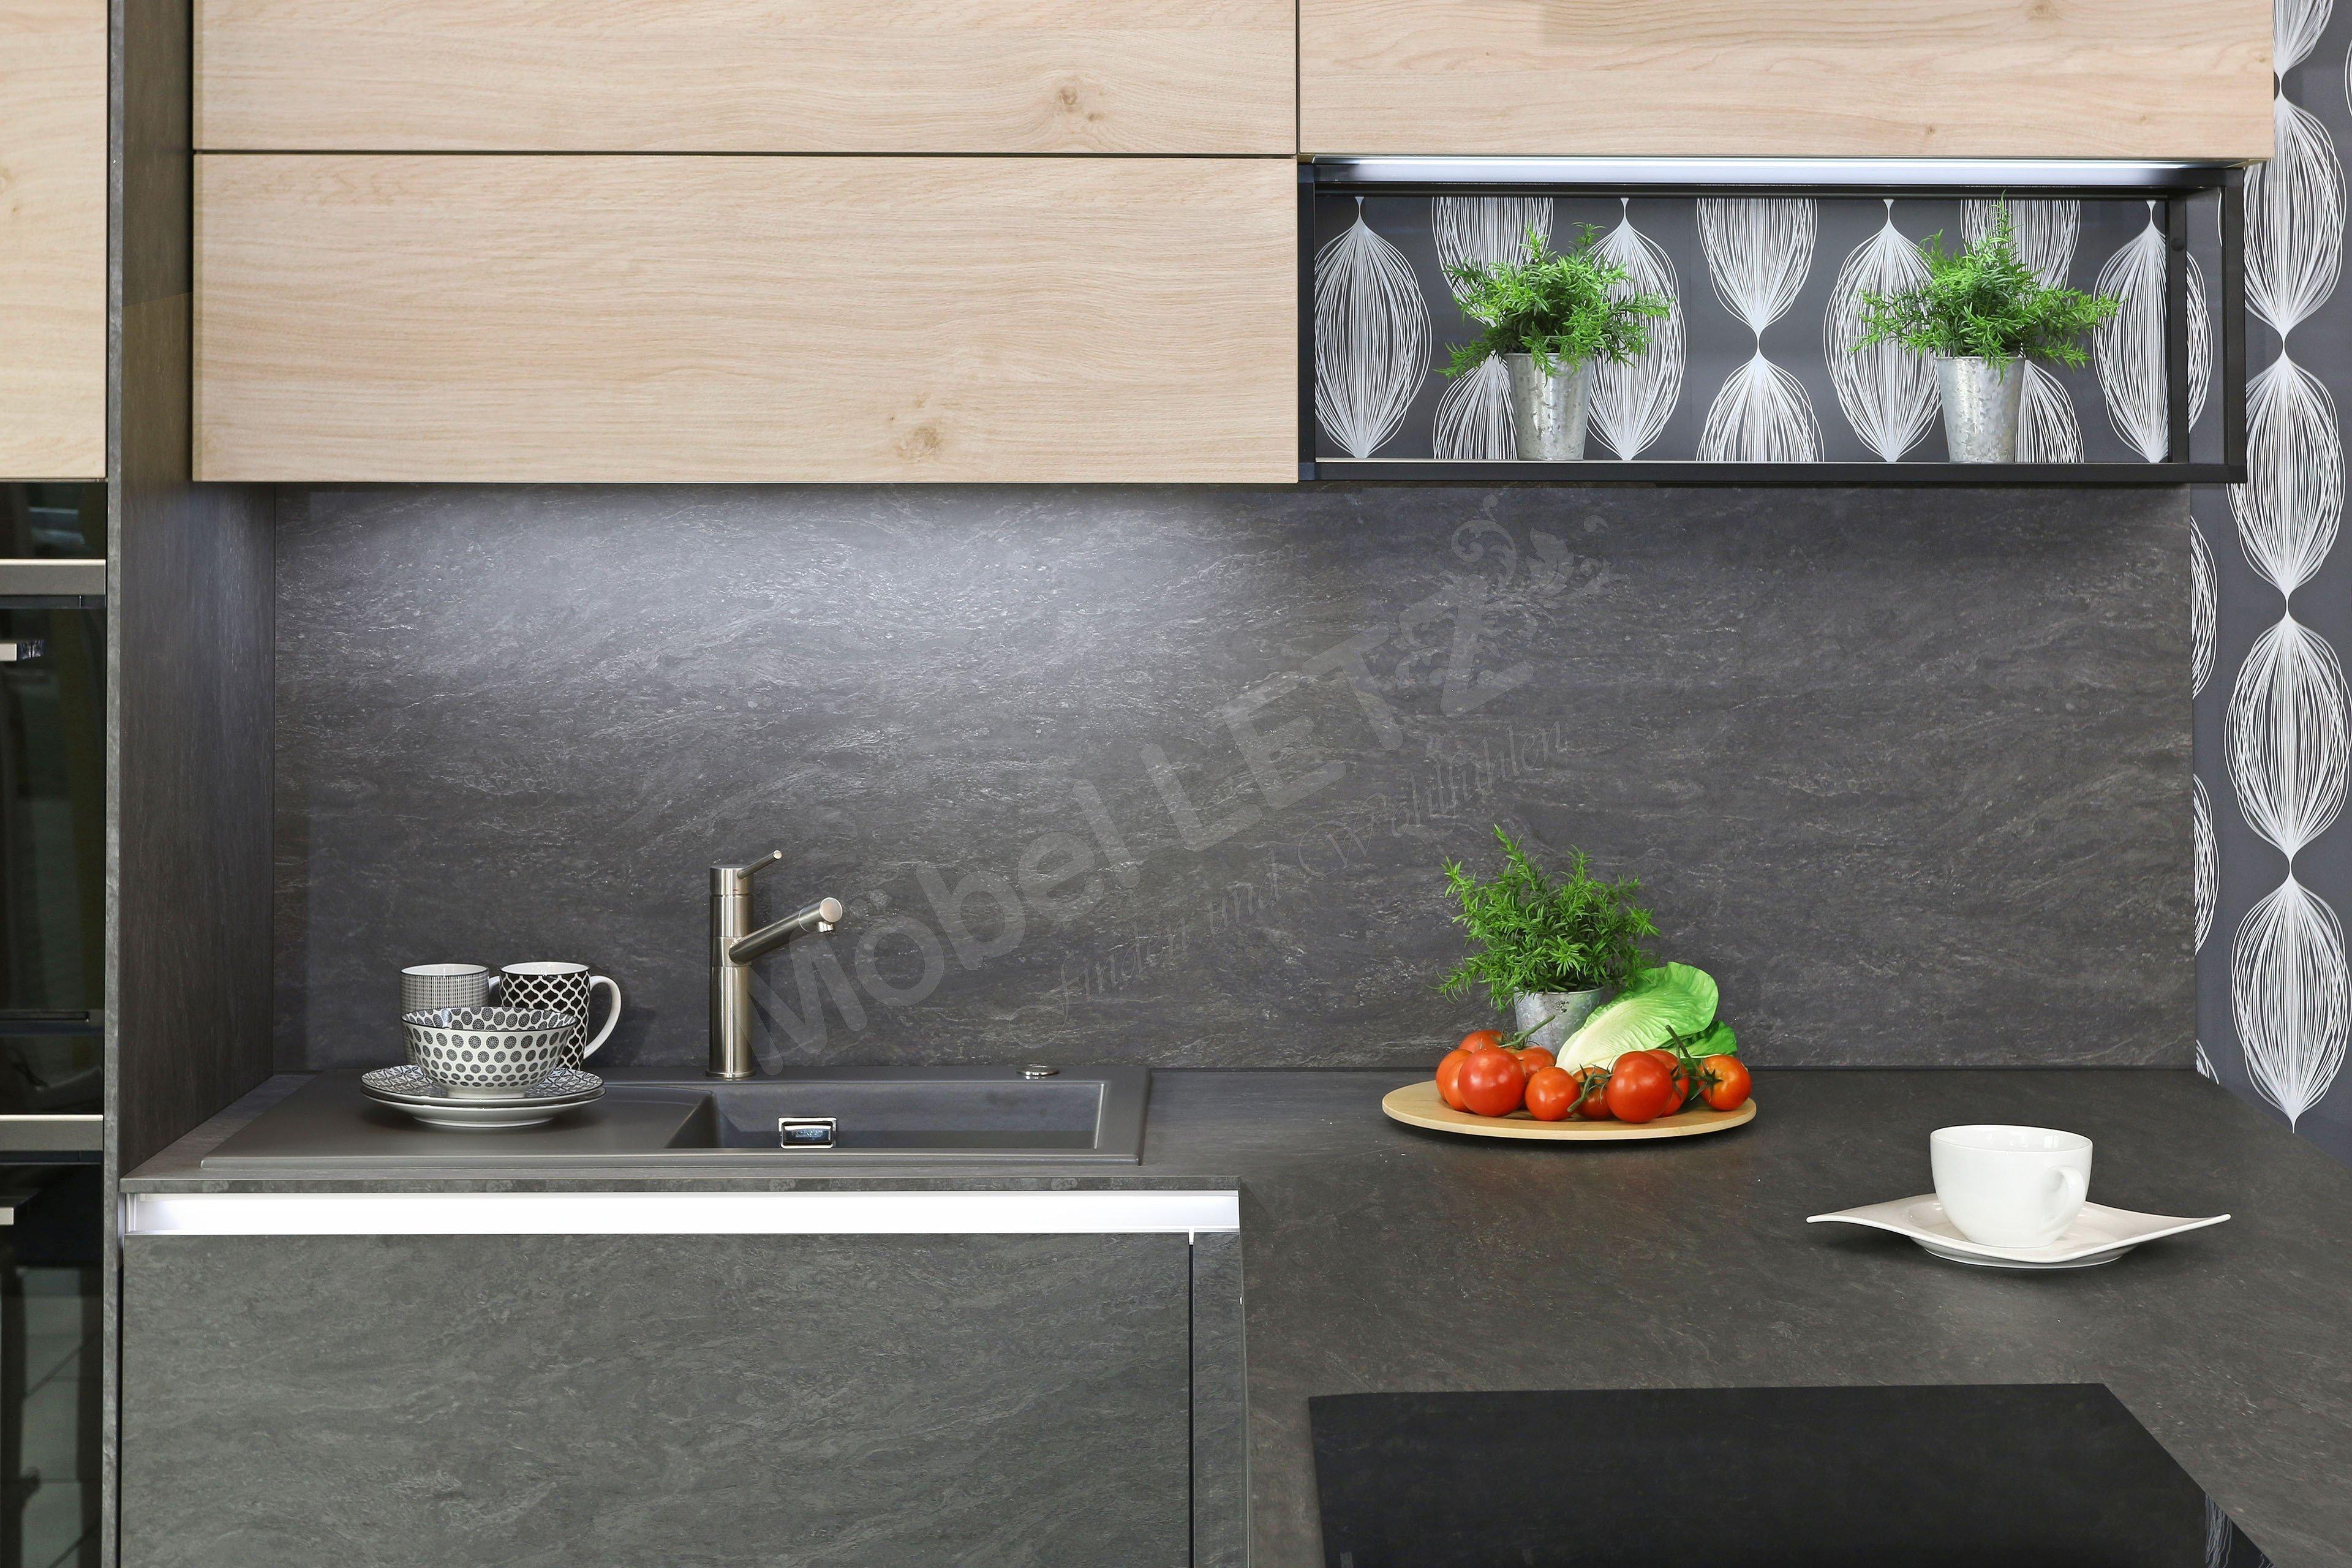 nolte k che h ngeschrank beleuchtung zweizeilige k che modern luftabzug schrank moderne dunkle. Black Bedroom Furniture Sets. Home Design Ideas